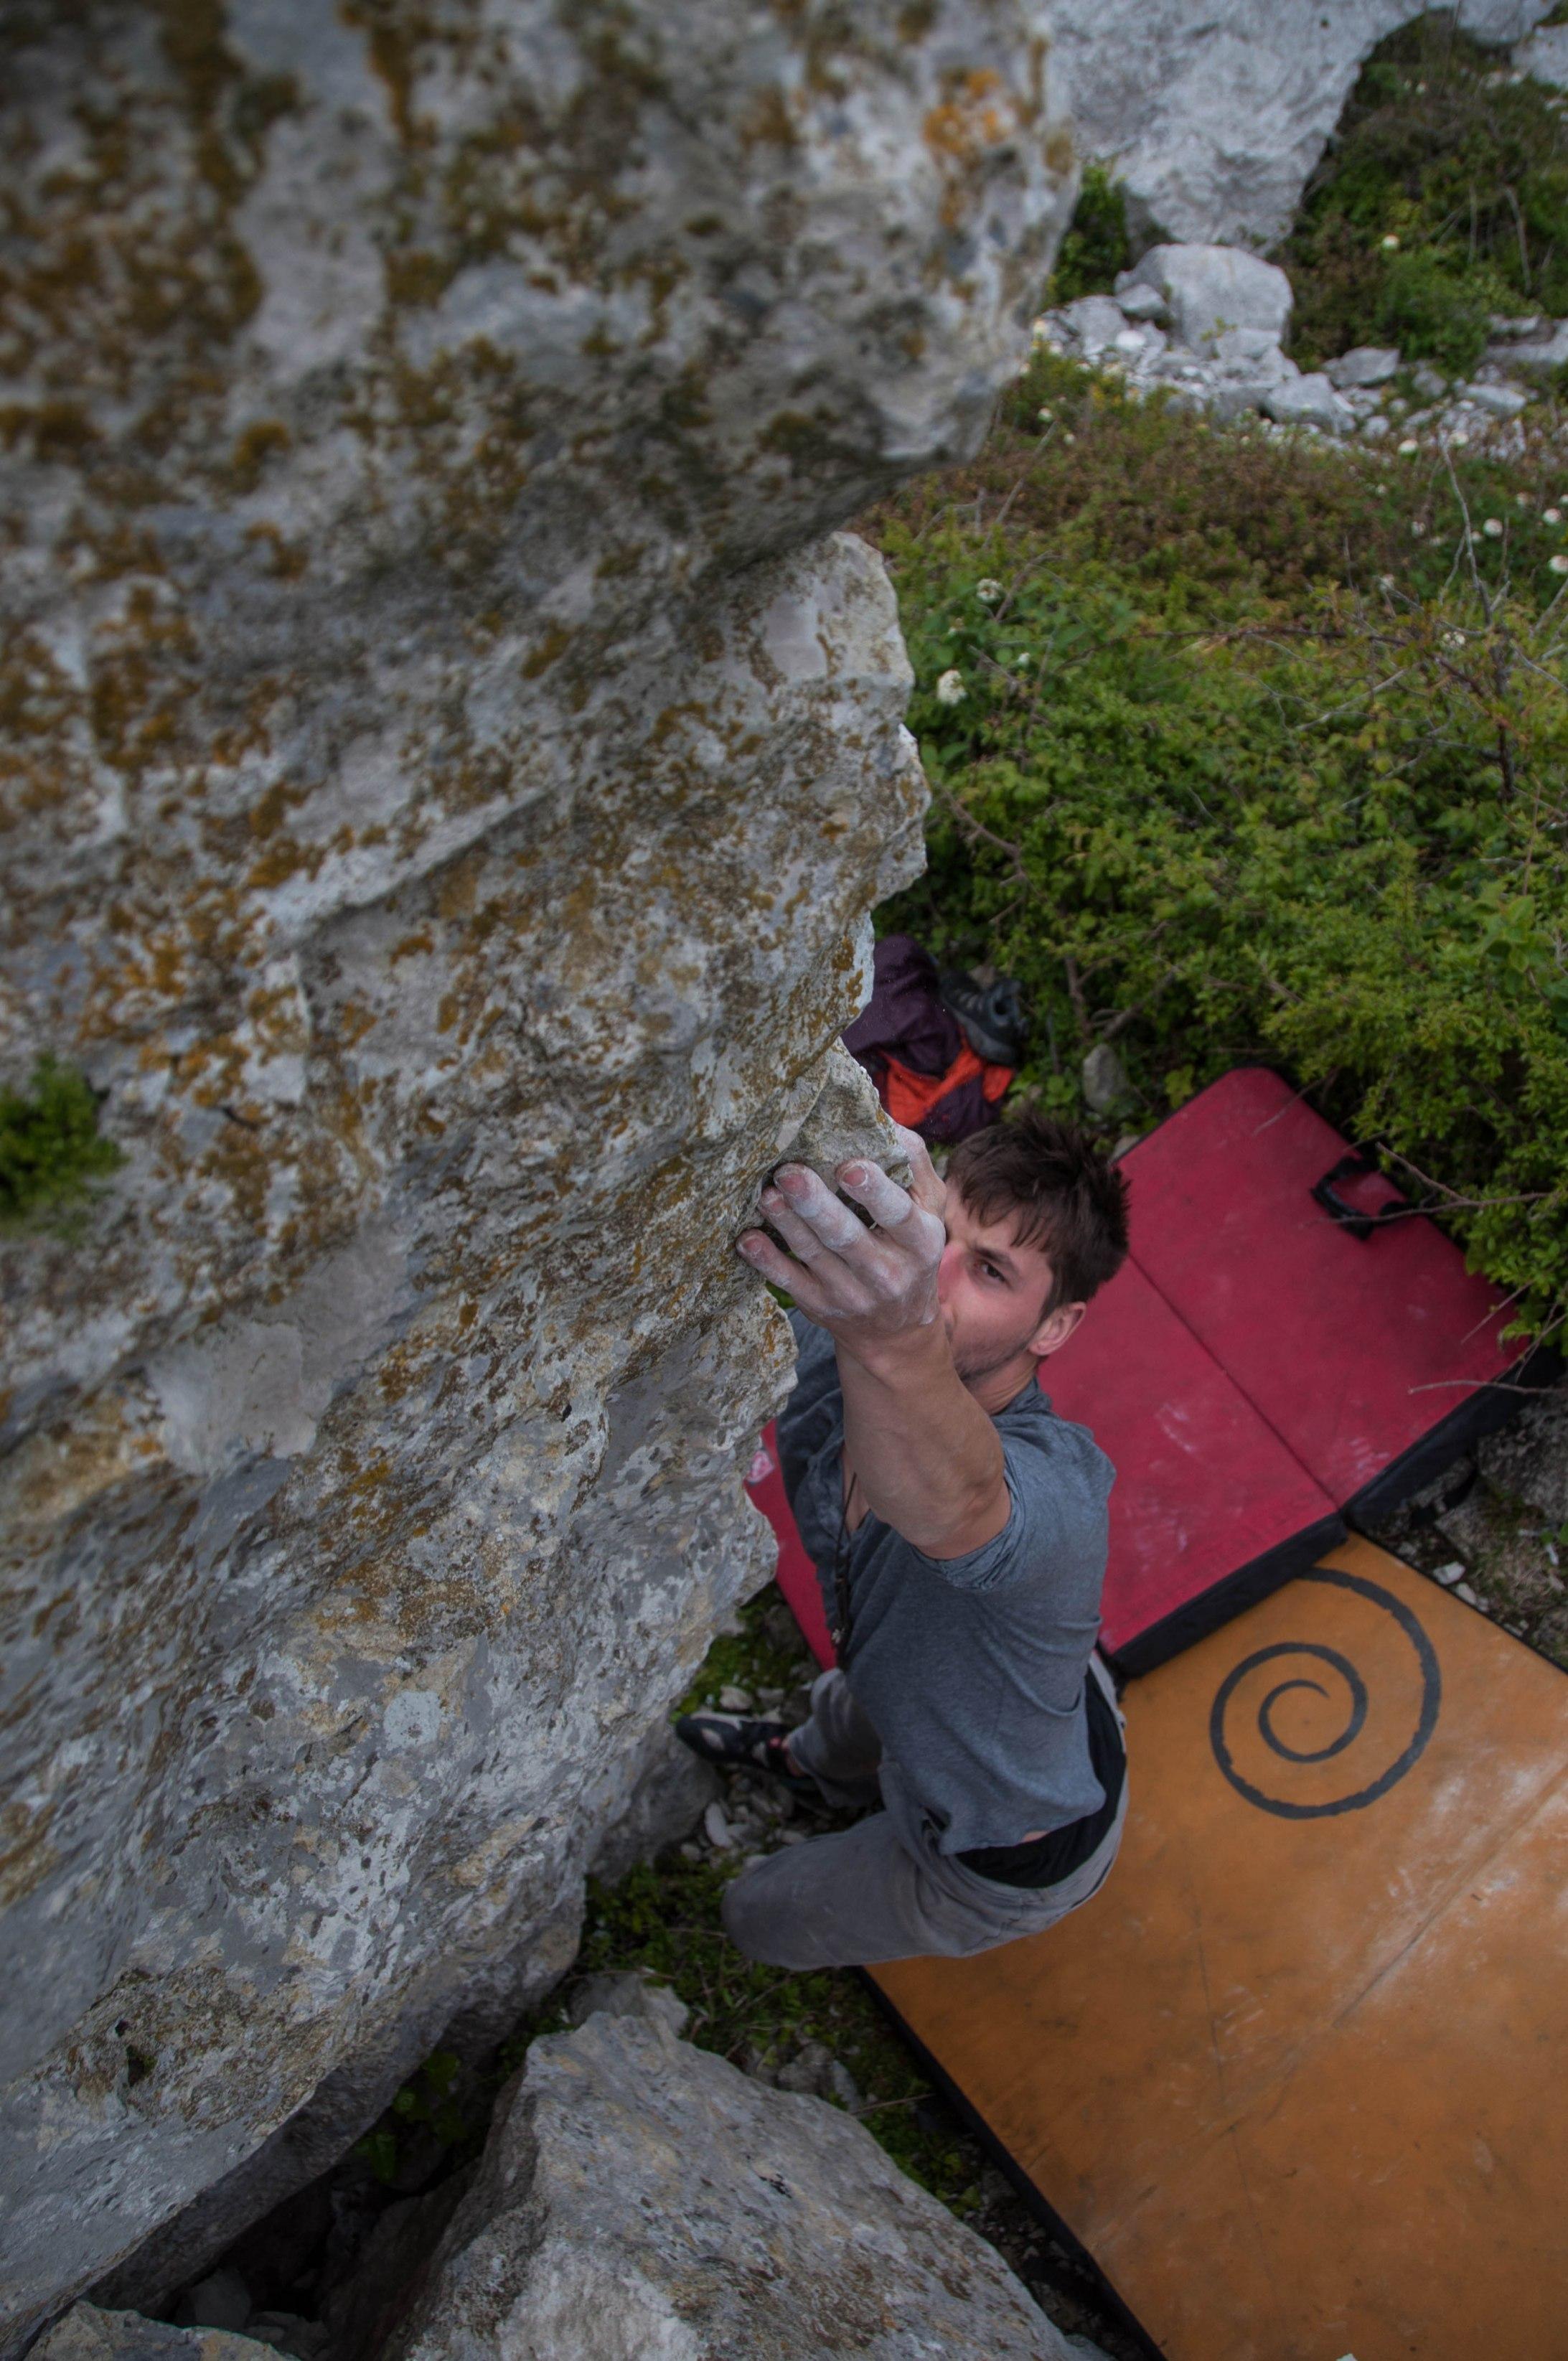 Pymn getting the reach at 'Bird Shit Boulder'.